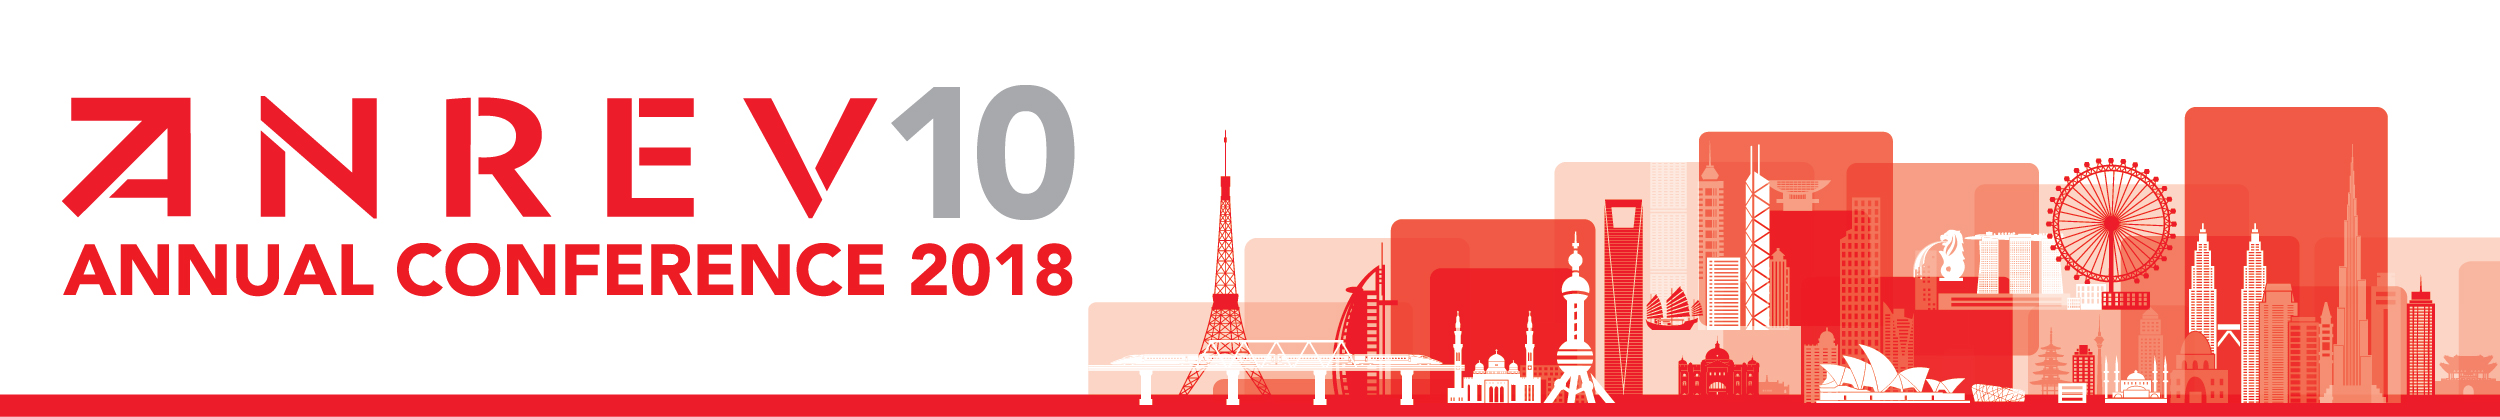 ANREV Annual Conference 2018